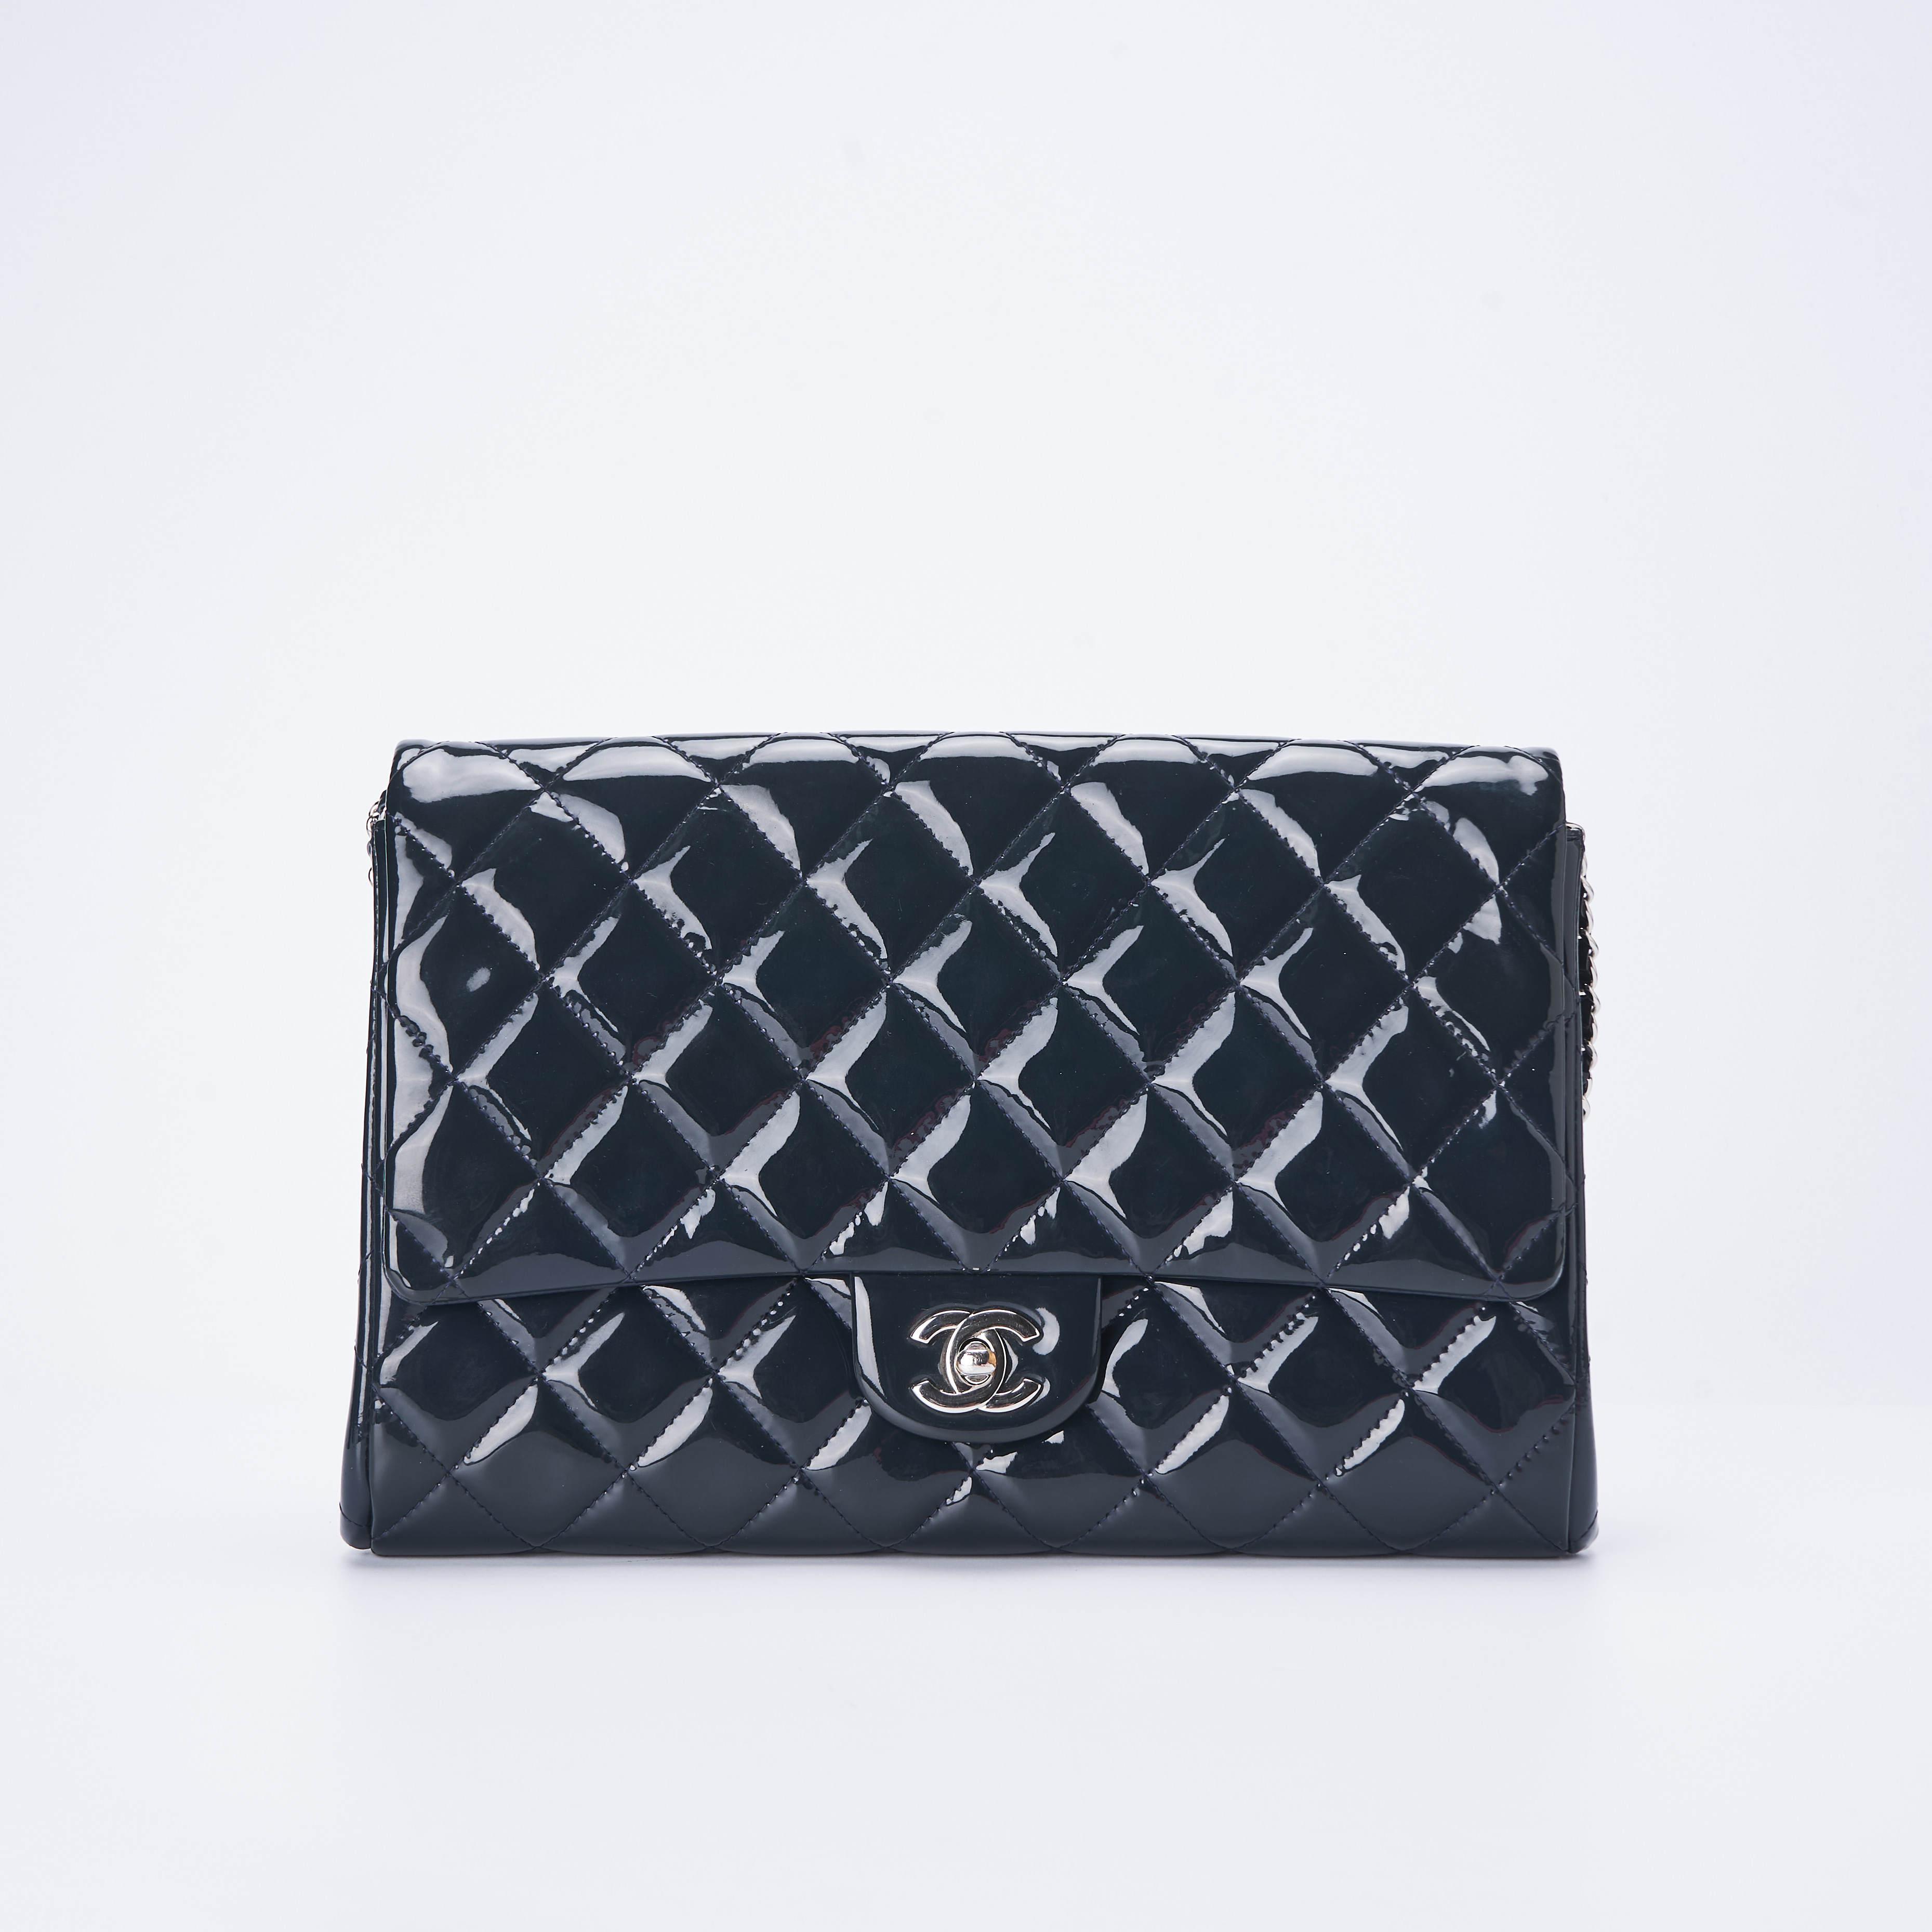 chanel链条包 【95新】Chanel香奈儿 漆皮链条单肩包 28*17*3 公价¥35000_推荐淘宝好看的chanel链条包